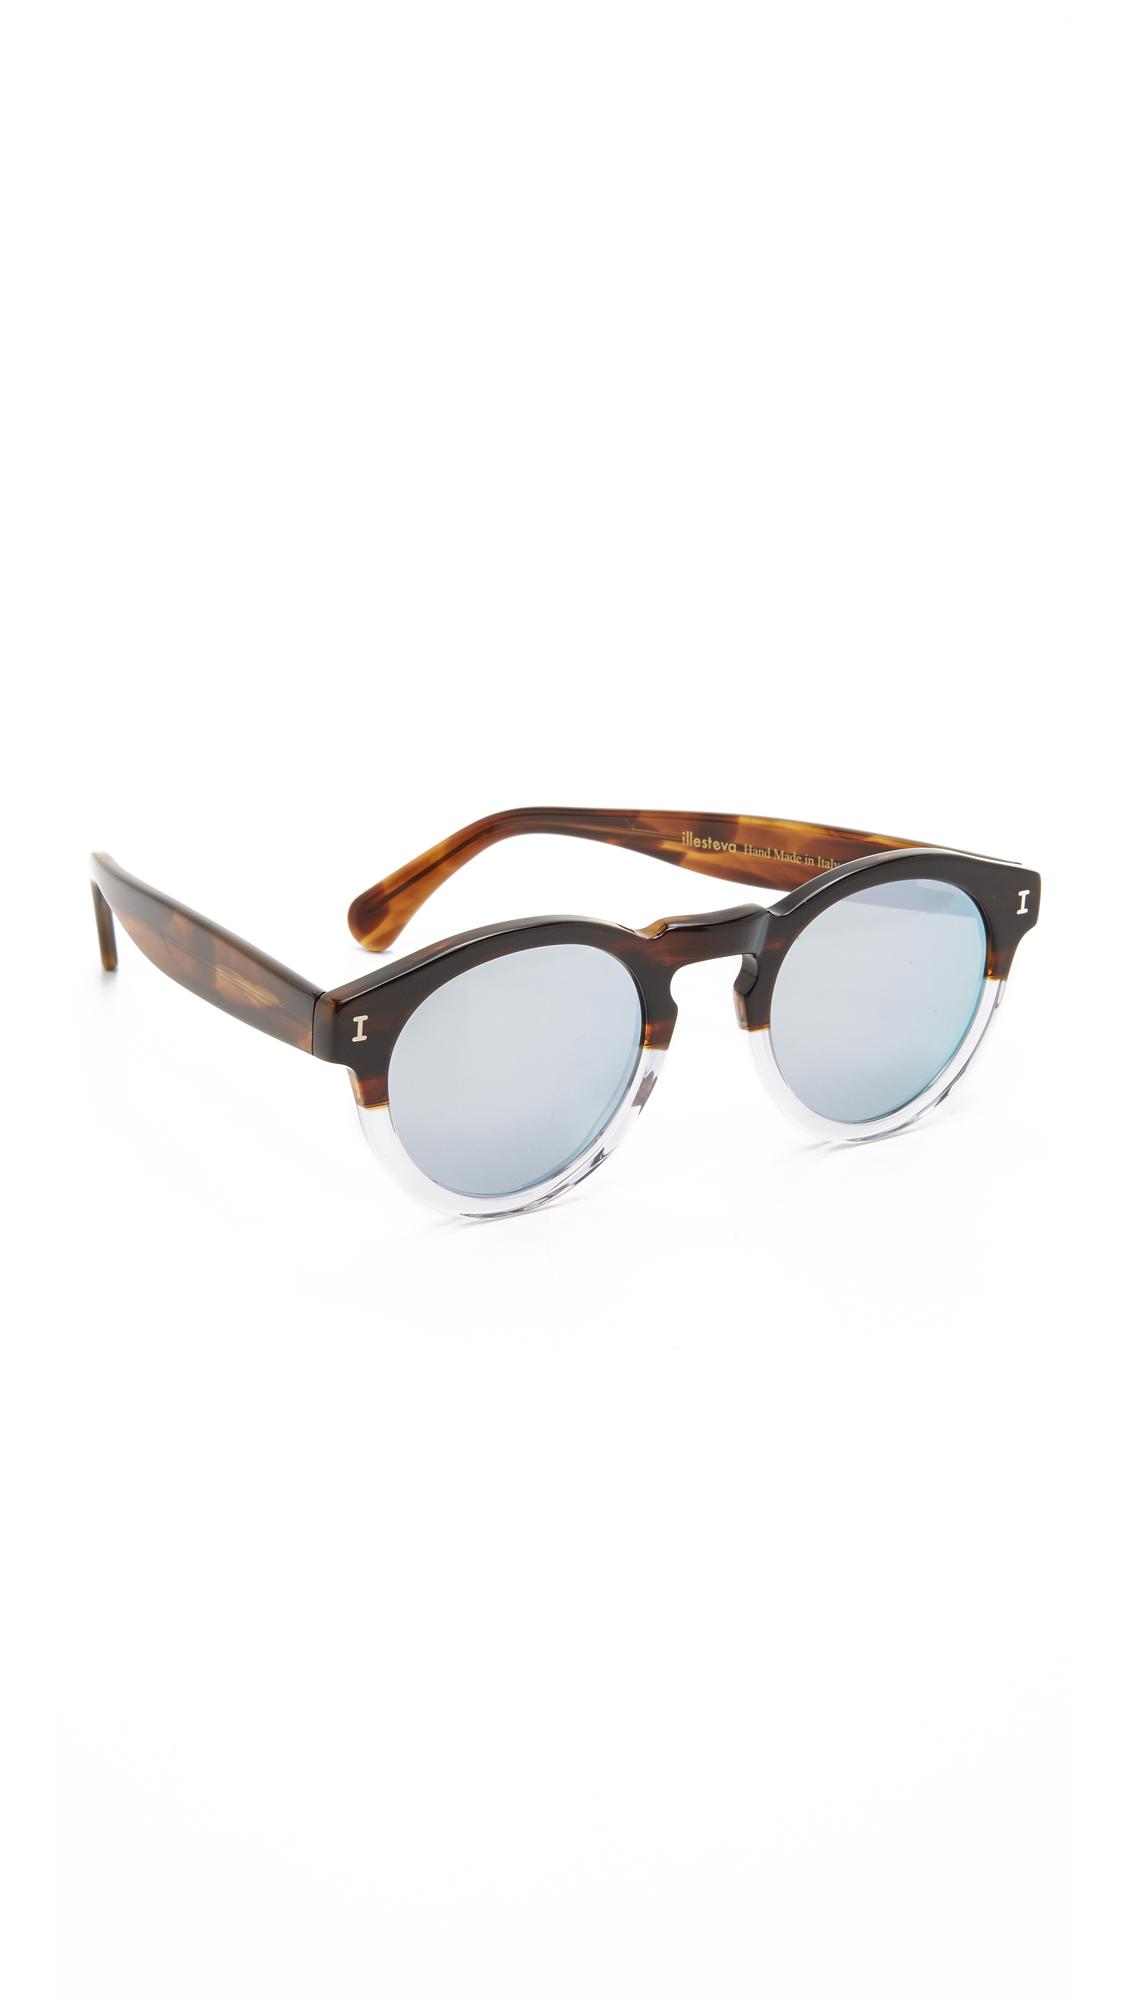 Illesteva Leonard Half & Half Mirrored Sunglasses in Brown